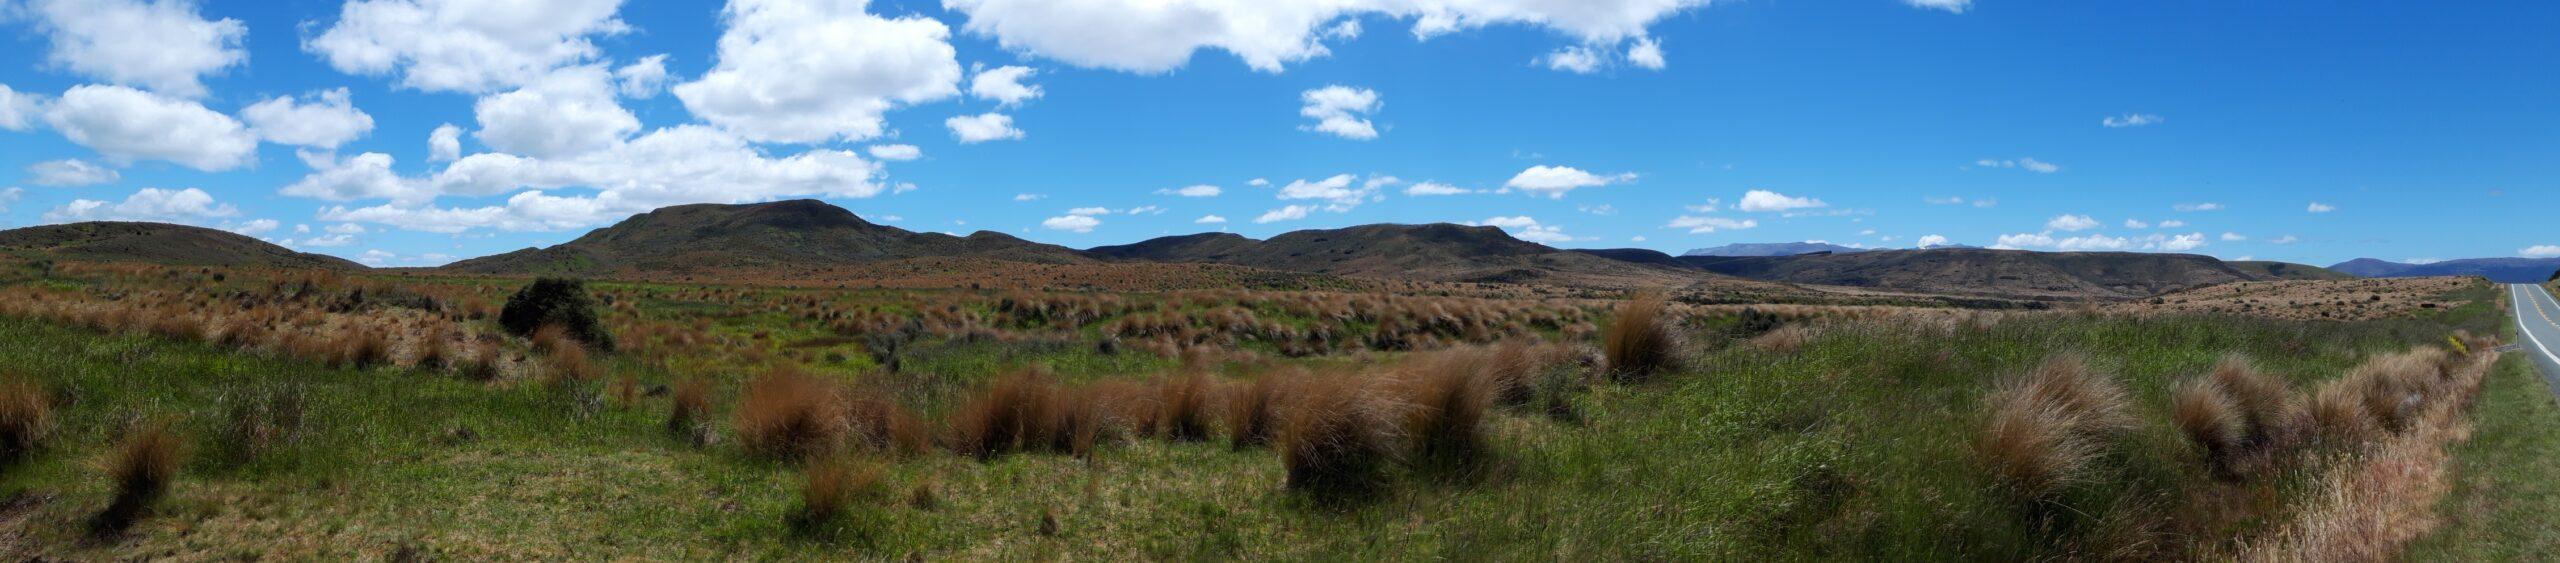 20191223_132856 - Neuseeland - Fiordland - Mossburn (NZ) - Te Anau (NZ) - Burwood Red Tussock Scientific Reserve - Red Tussock Gras (Chionochloa rubra)